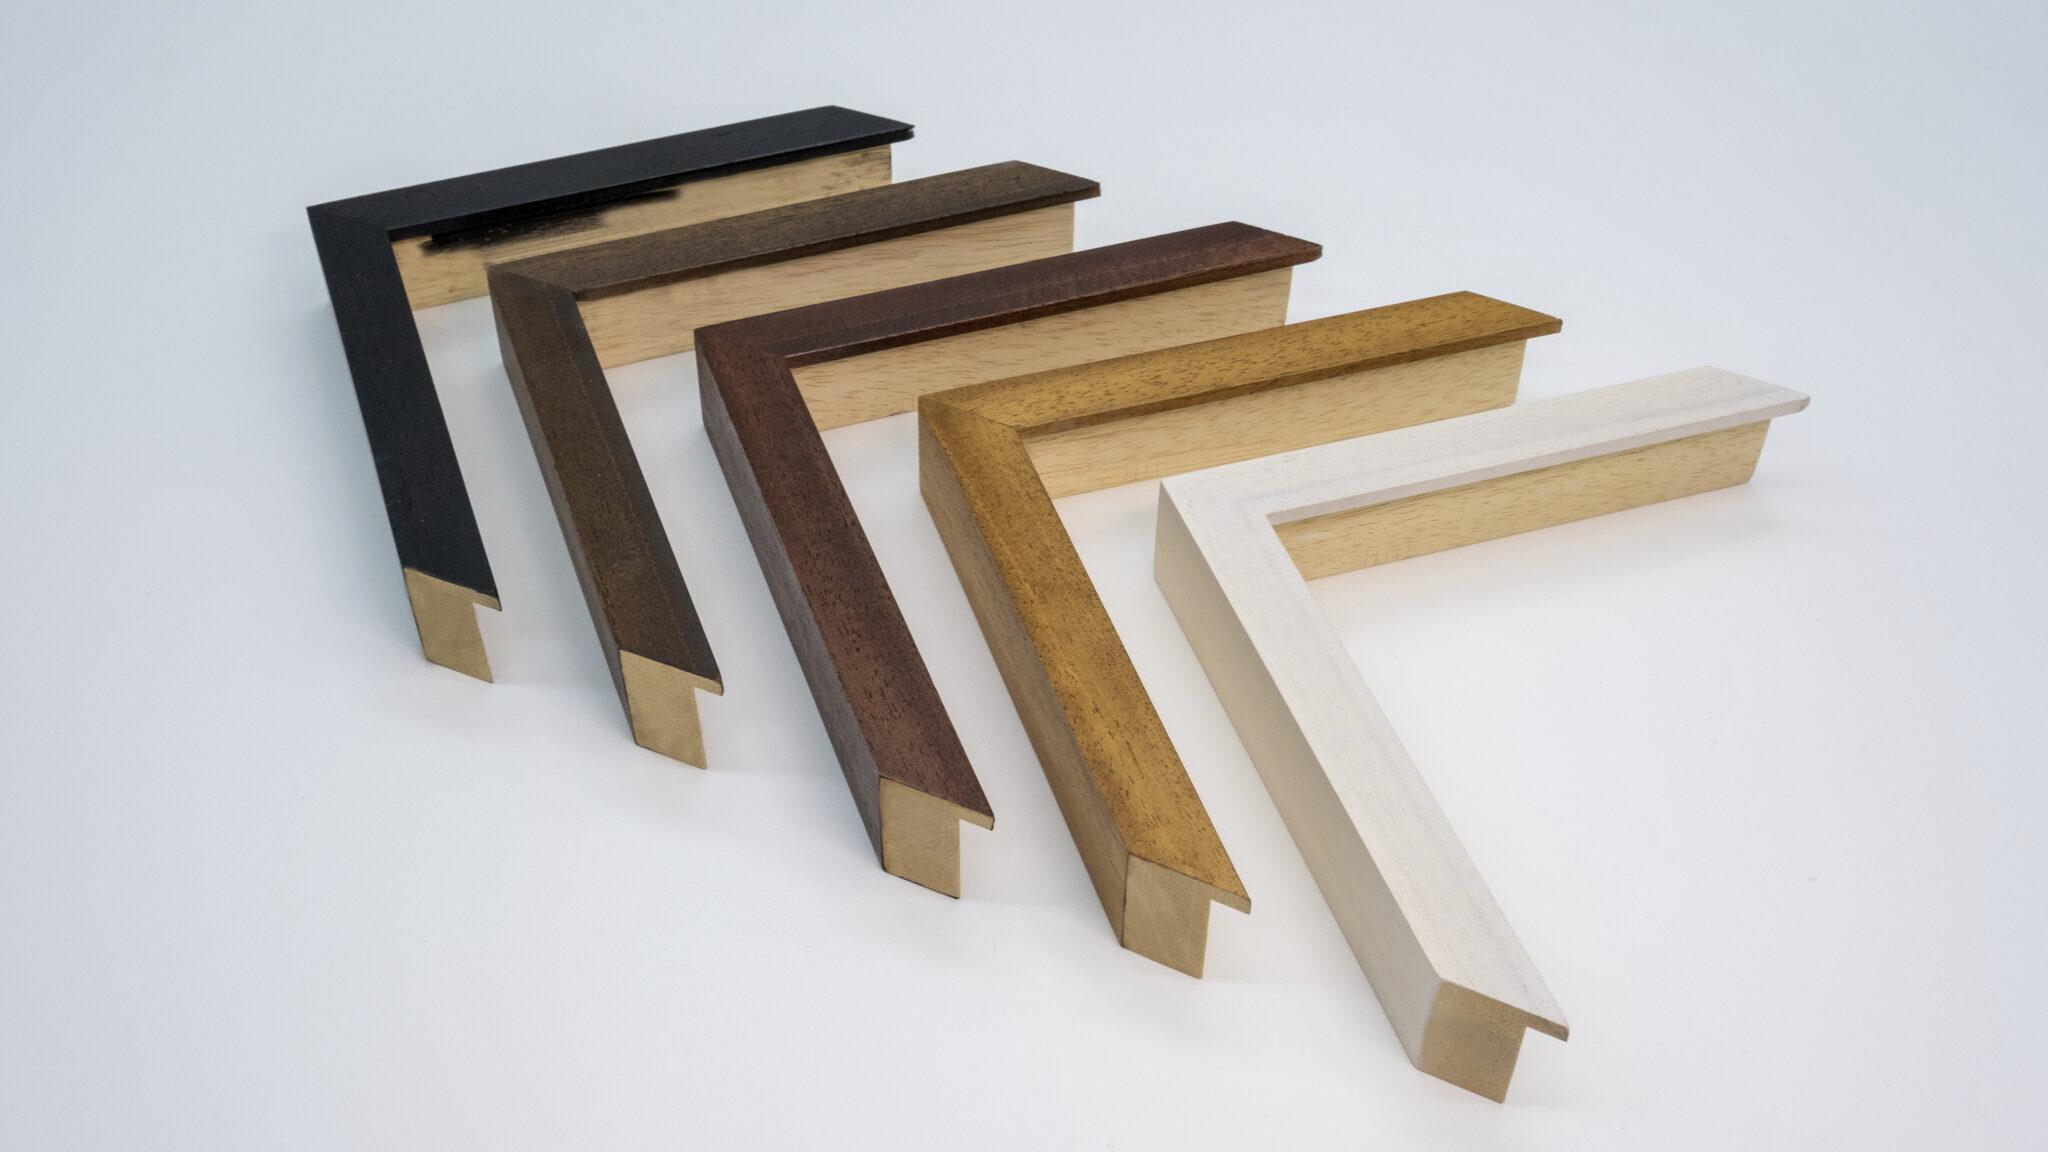 20mm x 30mm Wood Frame